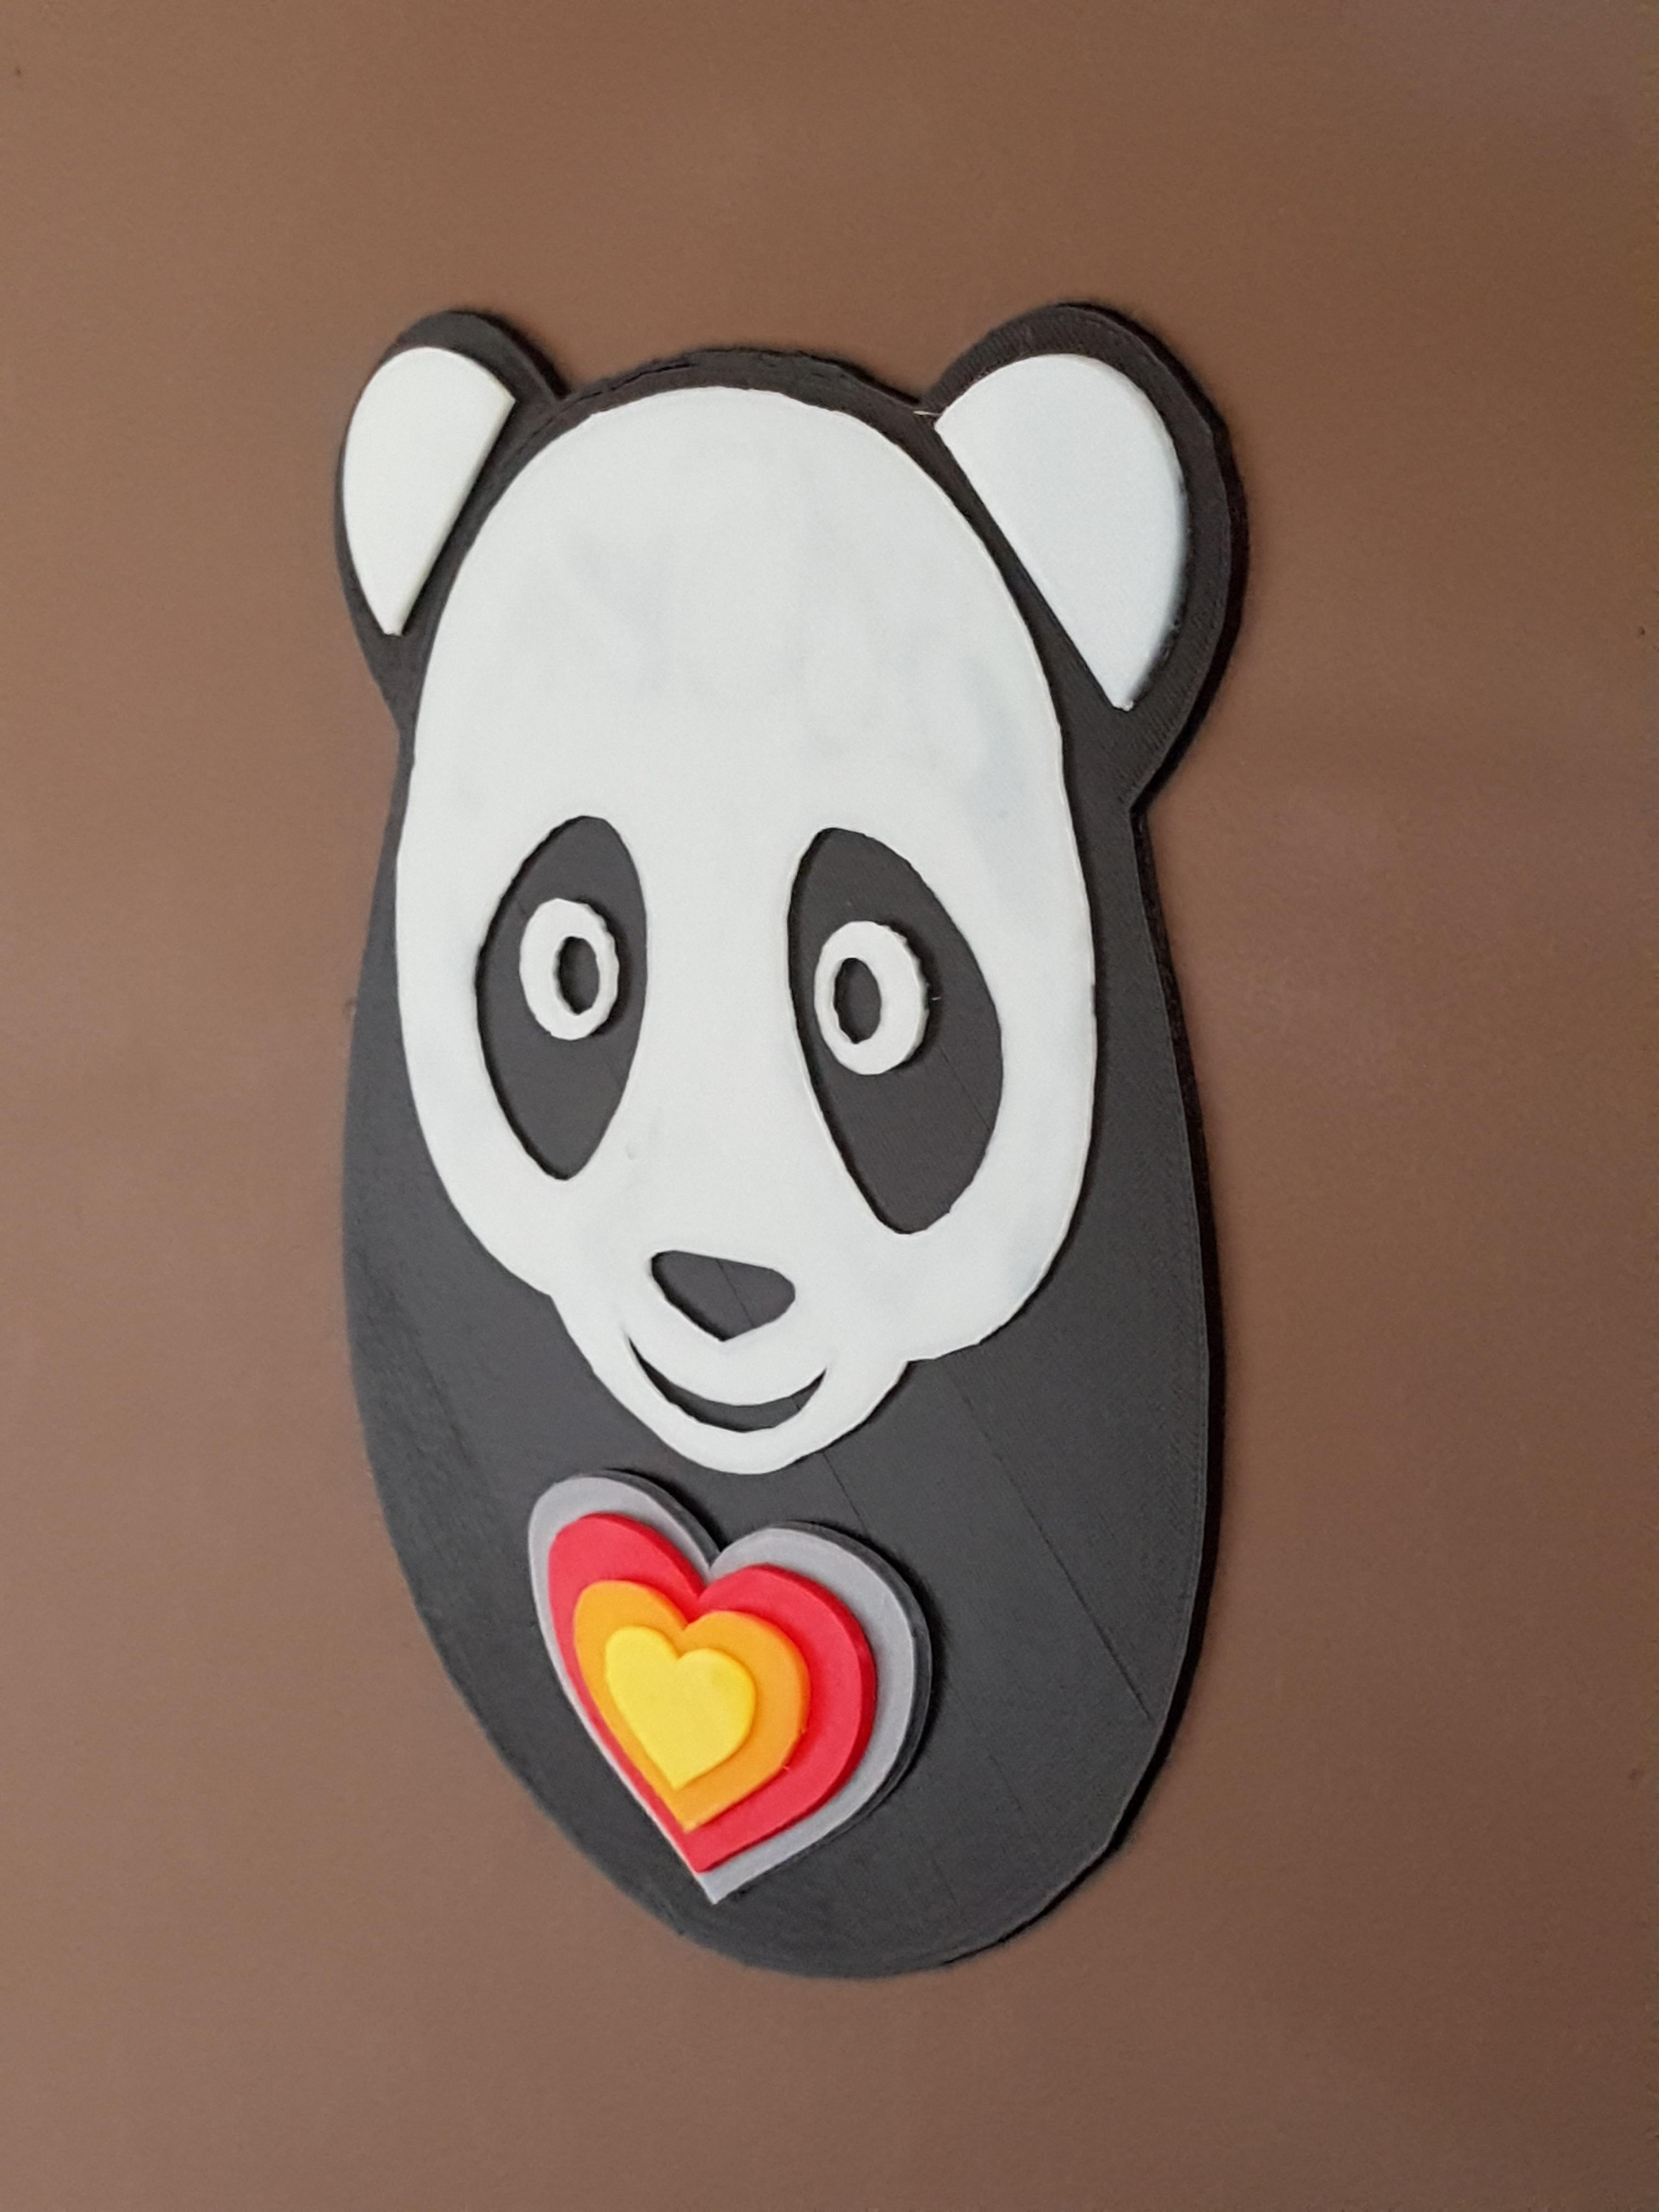 20170804_101229.jpg Download STL file panda hearts decoration • 3D printer template, catf3d